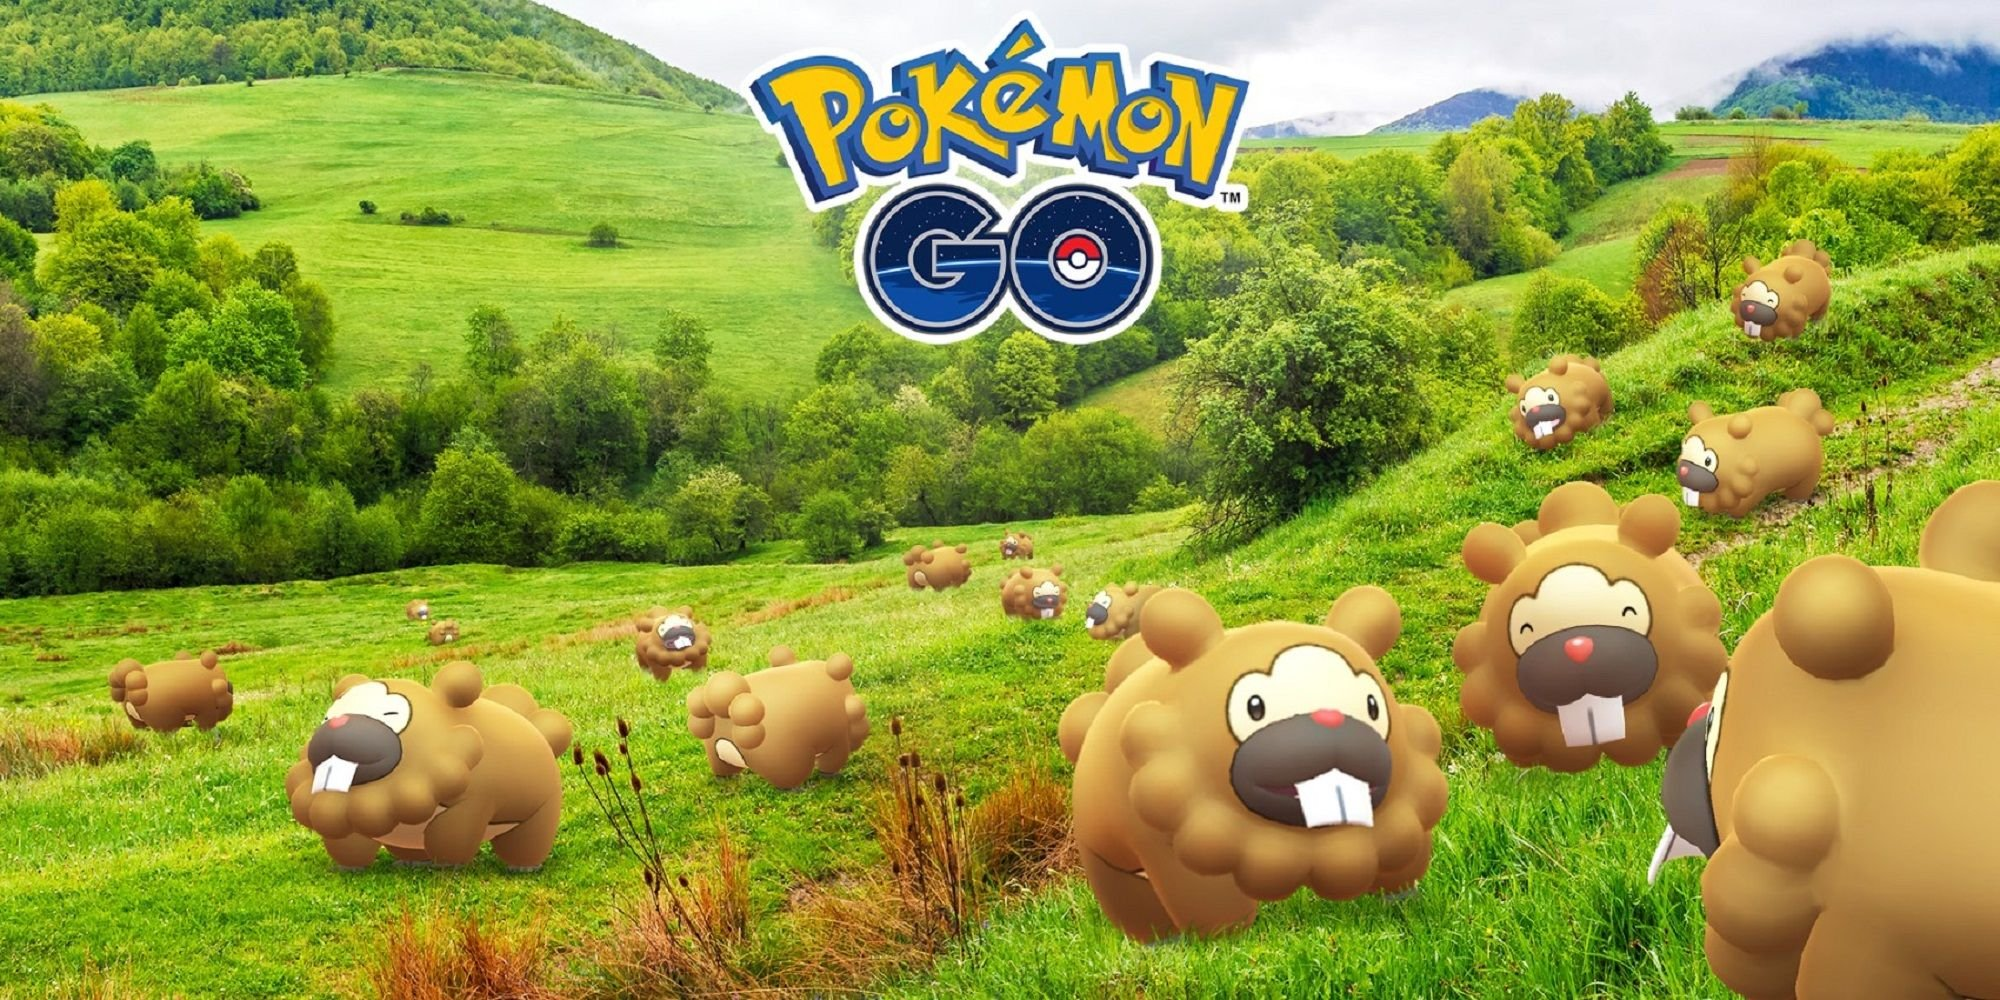 Pokemon Go Has Made $5 Billion